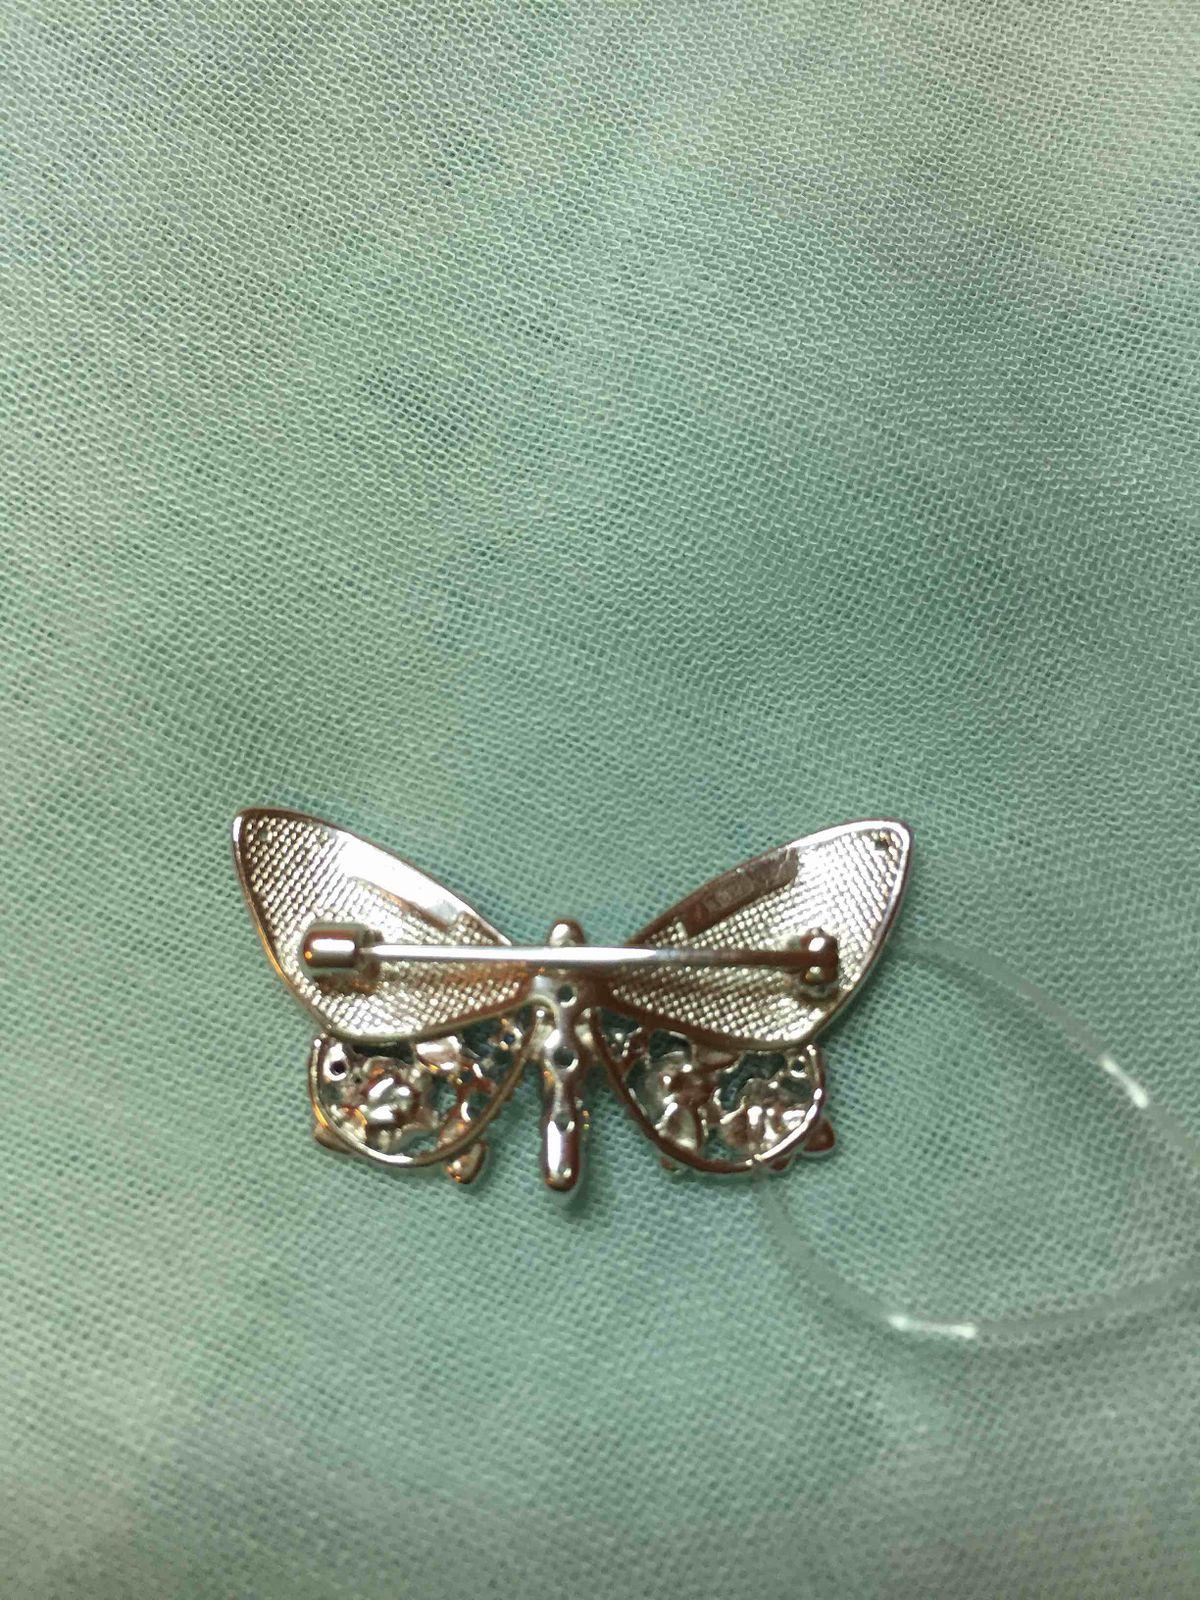 Очень красивая брошка-бабочка